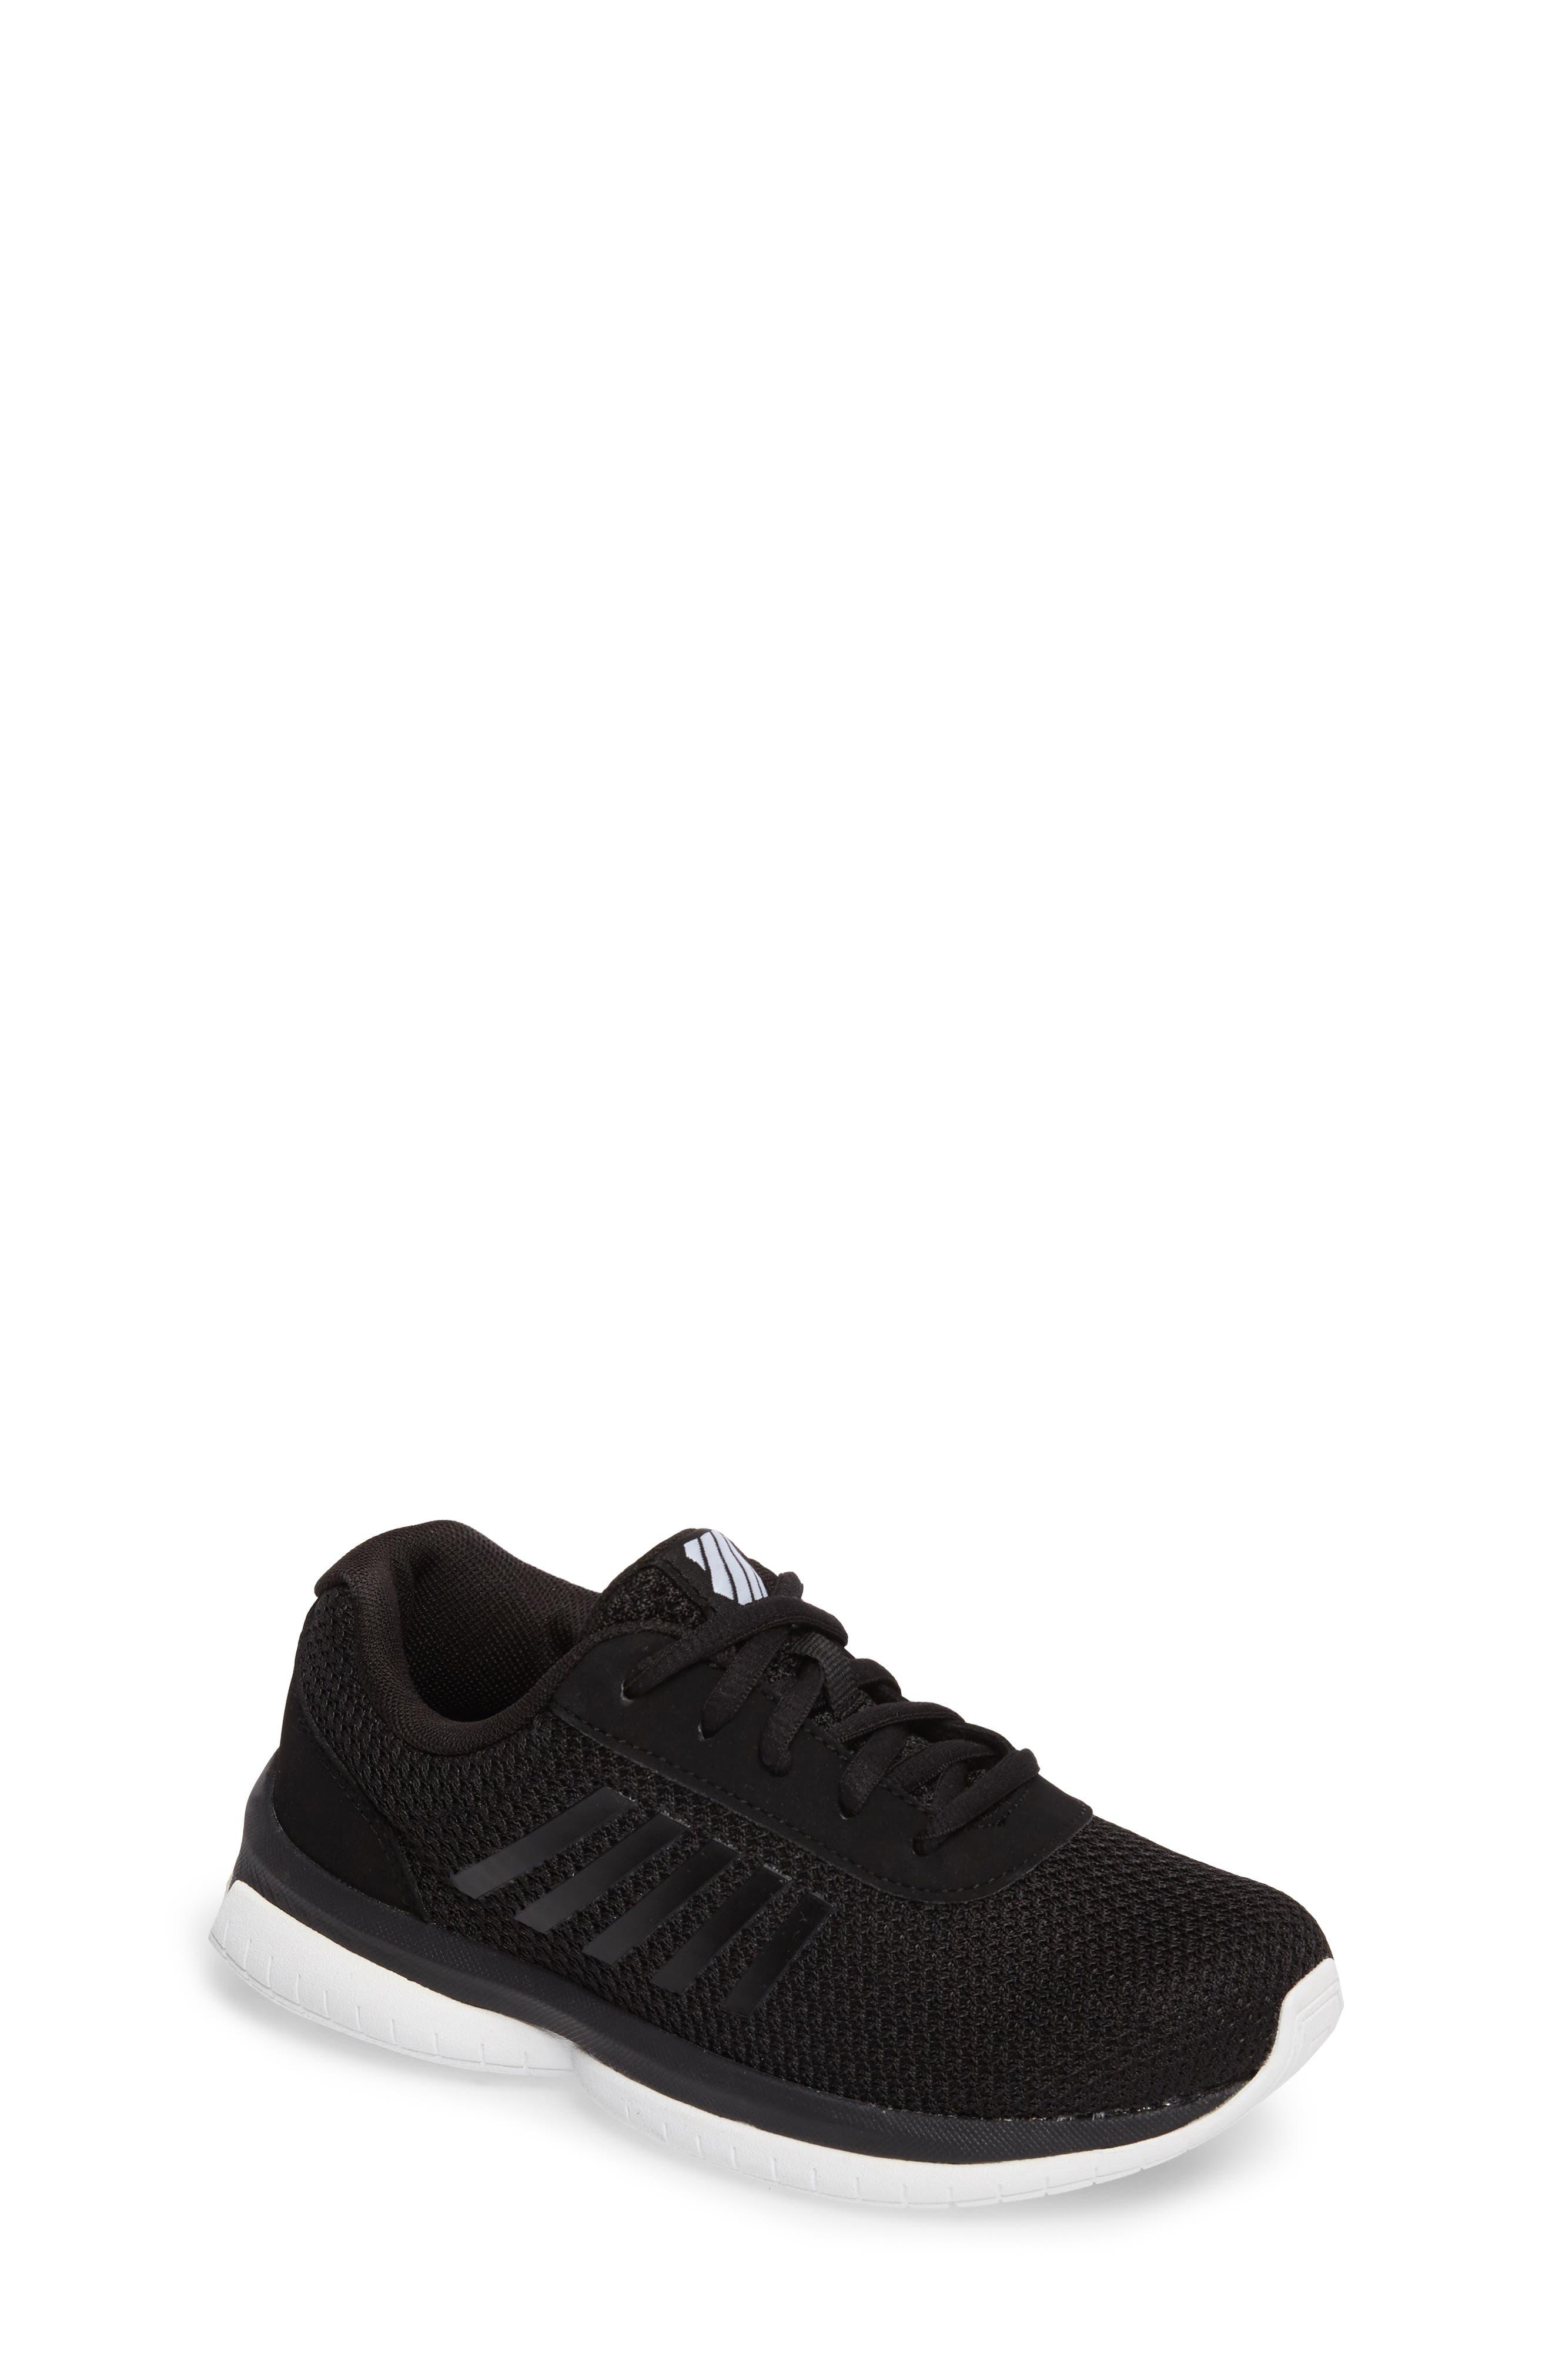 Tubes Infinity Sneaker,                         Main,                         color, Black/ White